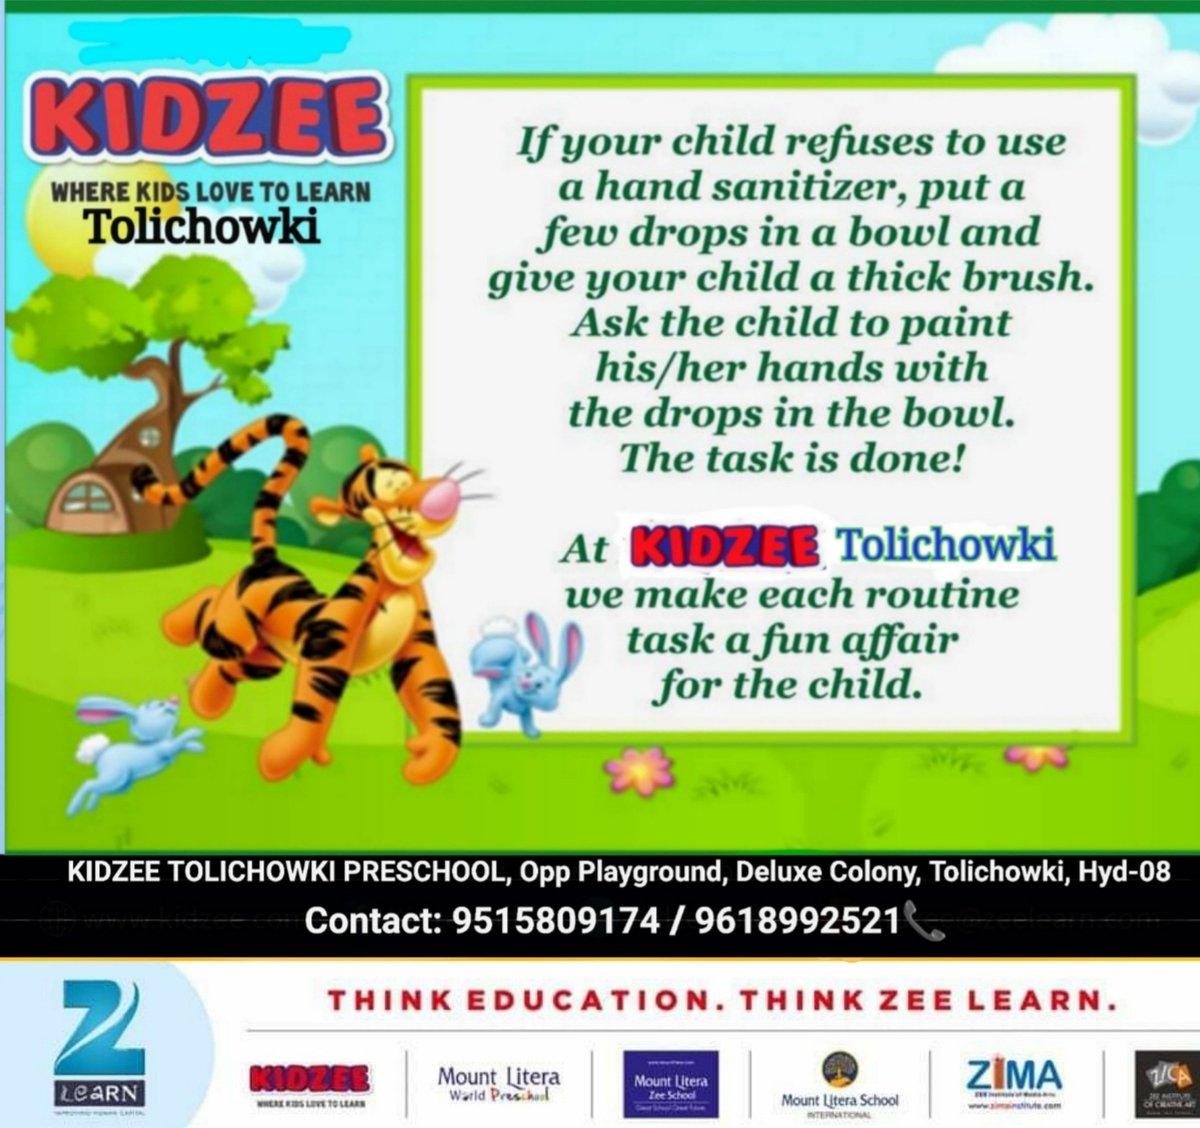 At KIDZEE TOLICHOWKI, we make each routine task a fun affair for the child. Keep sanitizing and stay healthy! . . . #kidzeetolichowki #keepsanitizing #KidzeeStudents #stayhealthy #StayHome #staysafe #admissionopen2020_21  #bestpreschool #kidzeeindia #healthytips #sanitize https://t.co/CZnsWDoFN8